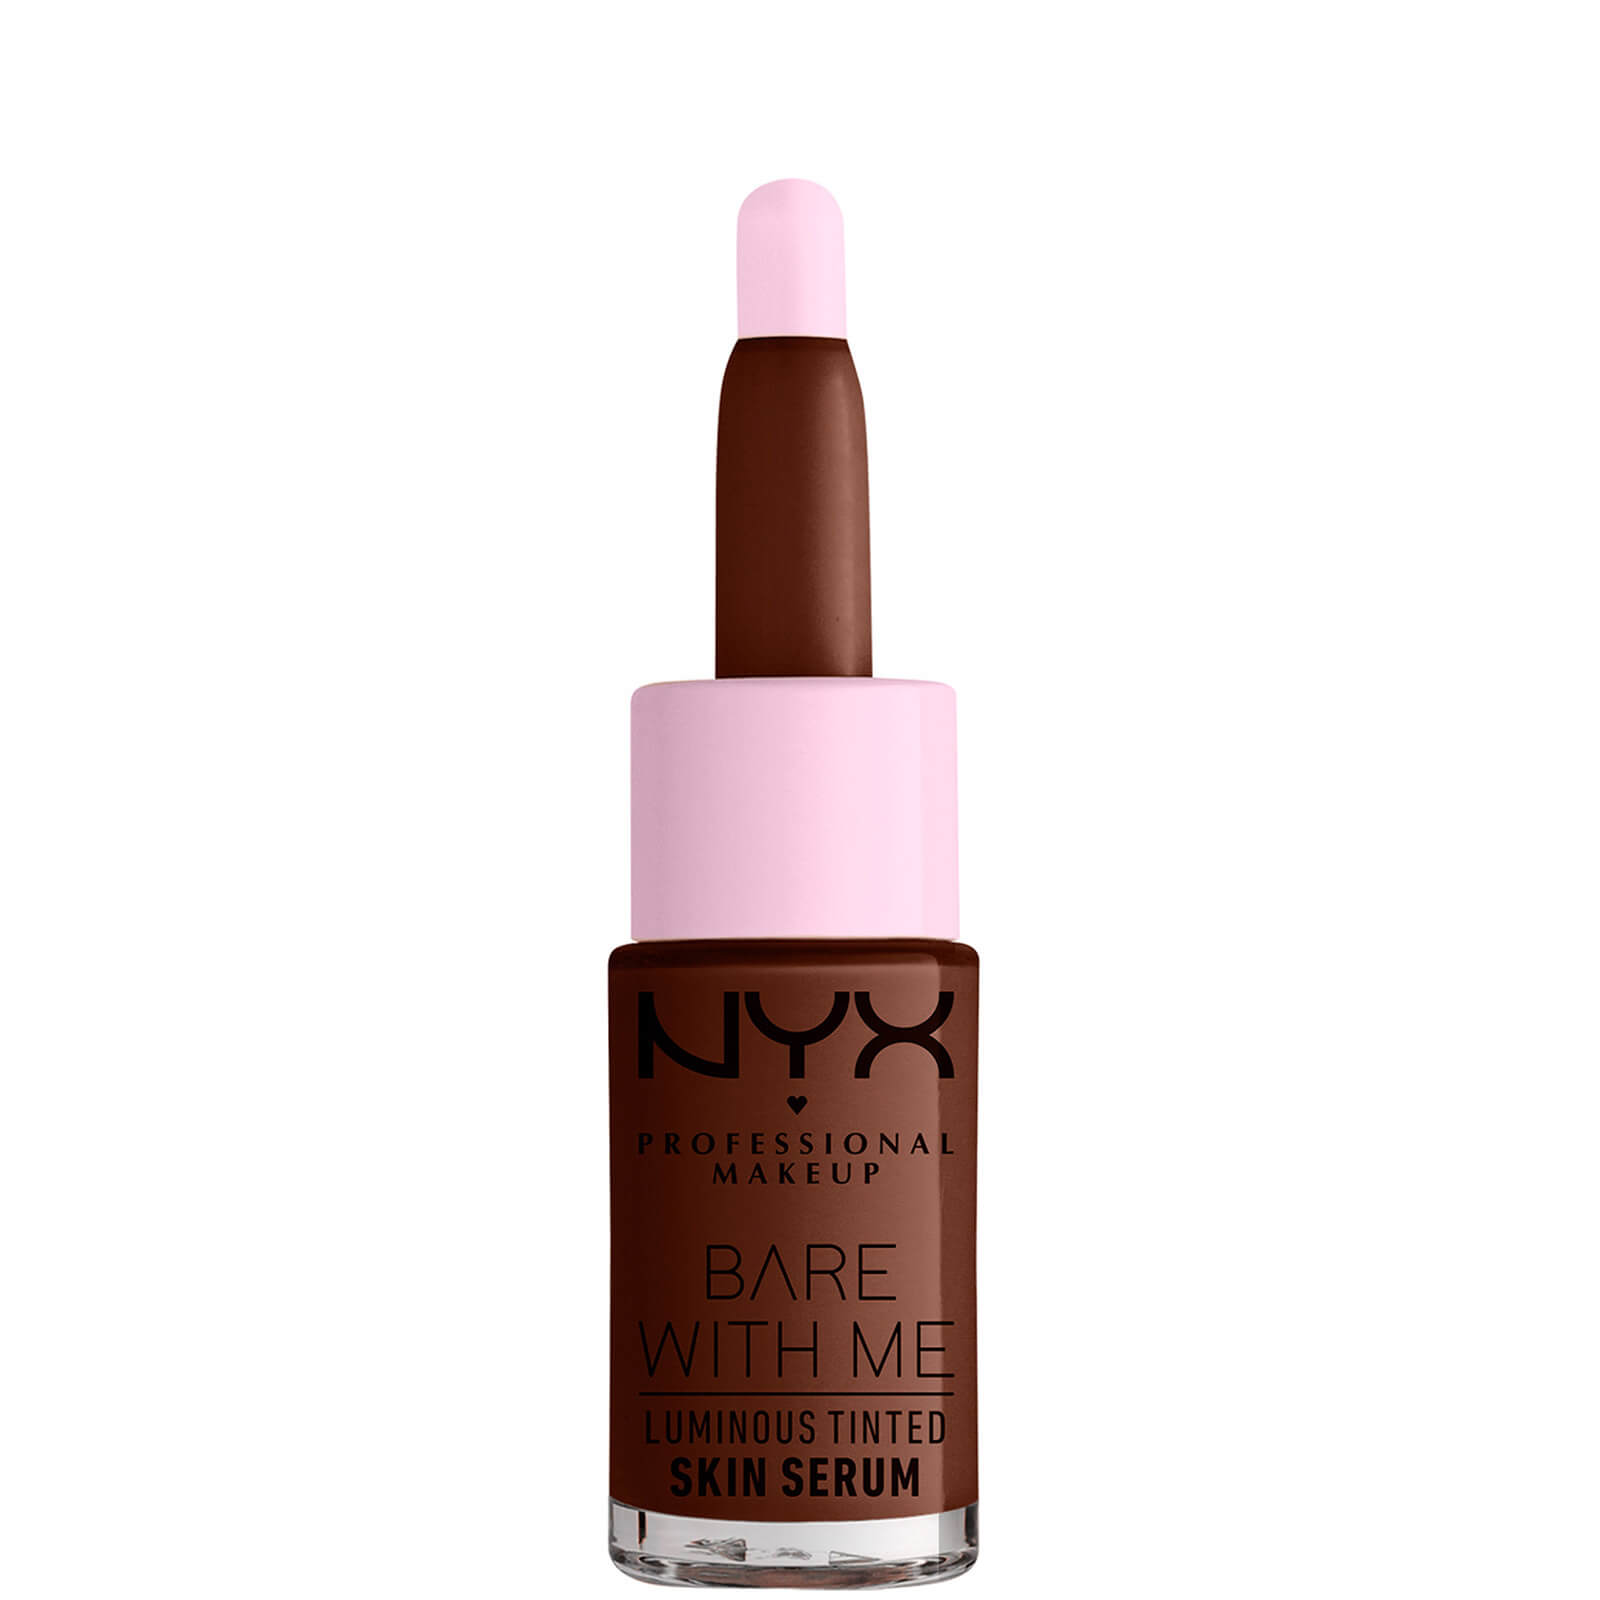 Купить NYX Professional Makeup Bare With Me Luminous Tinted Skin Serum 12.6g (Various Shades) - Deep